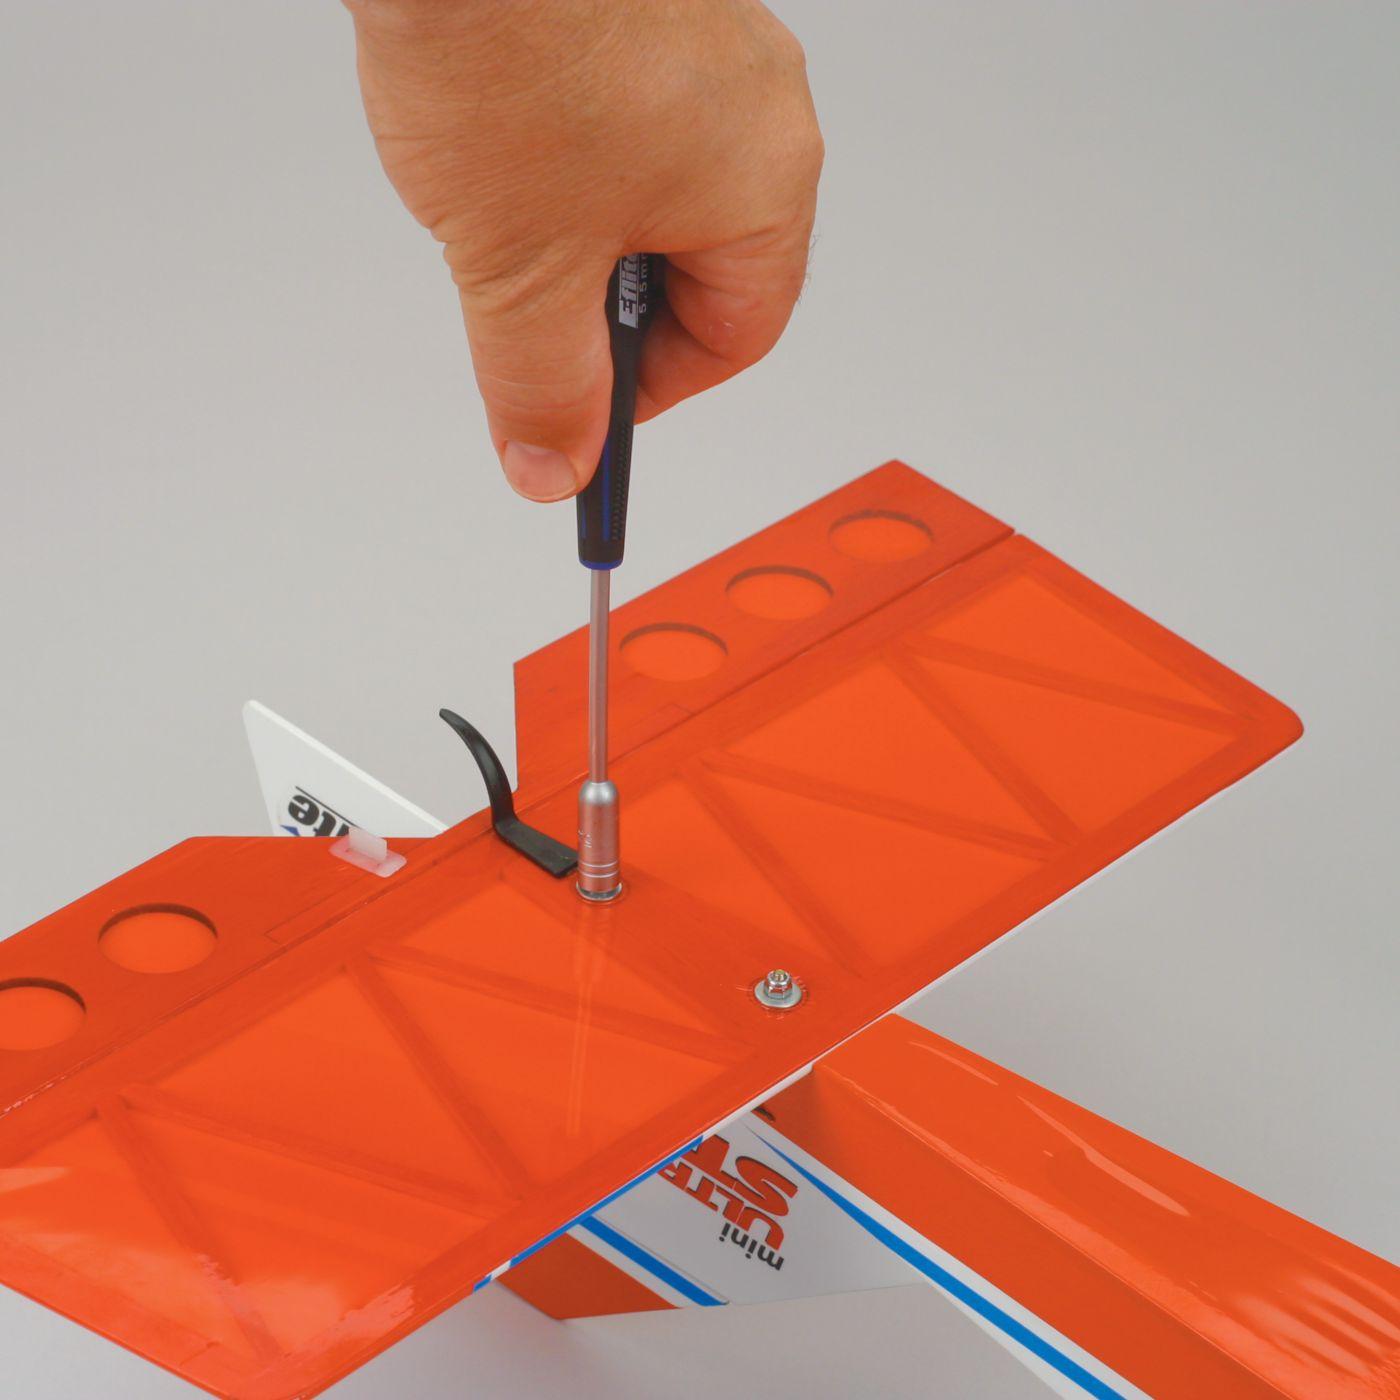 e-flite mini ultra stick manual